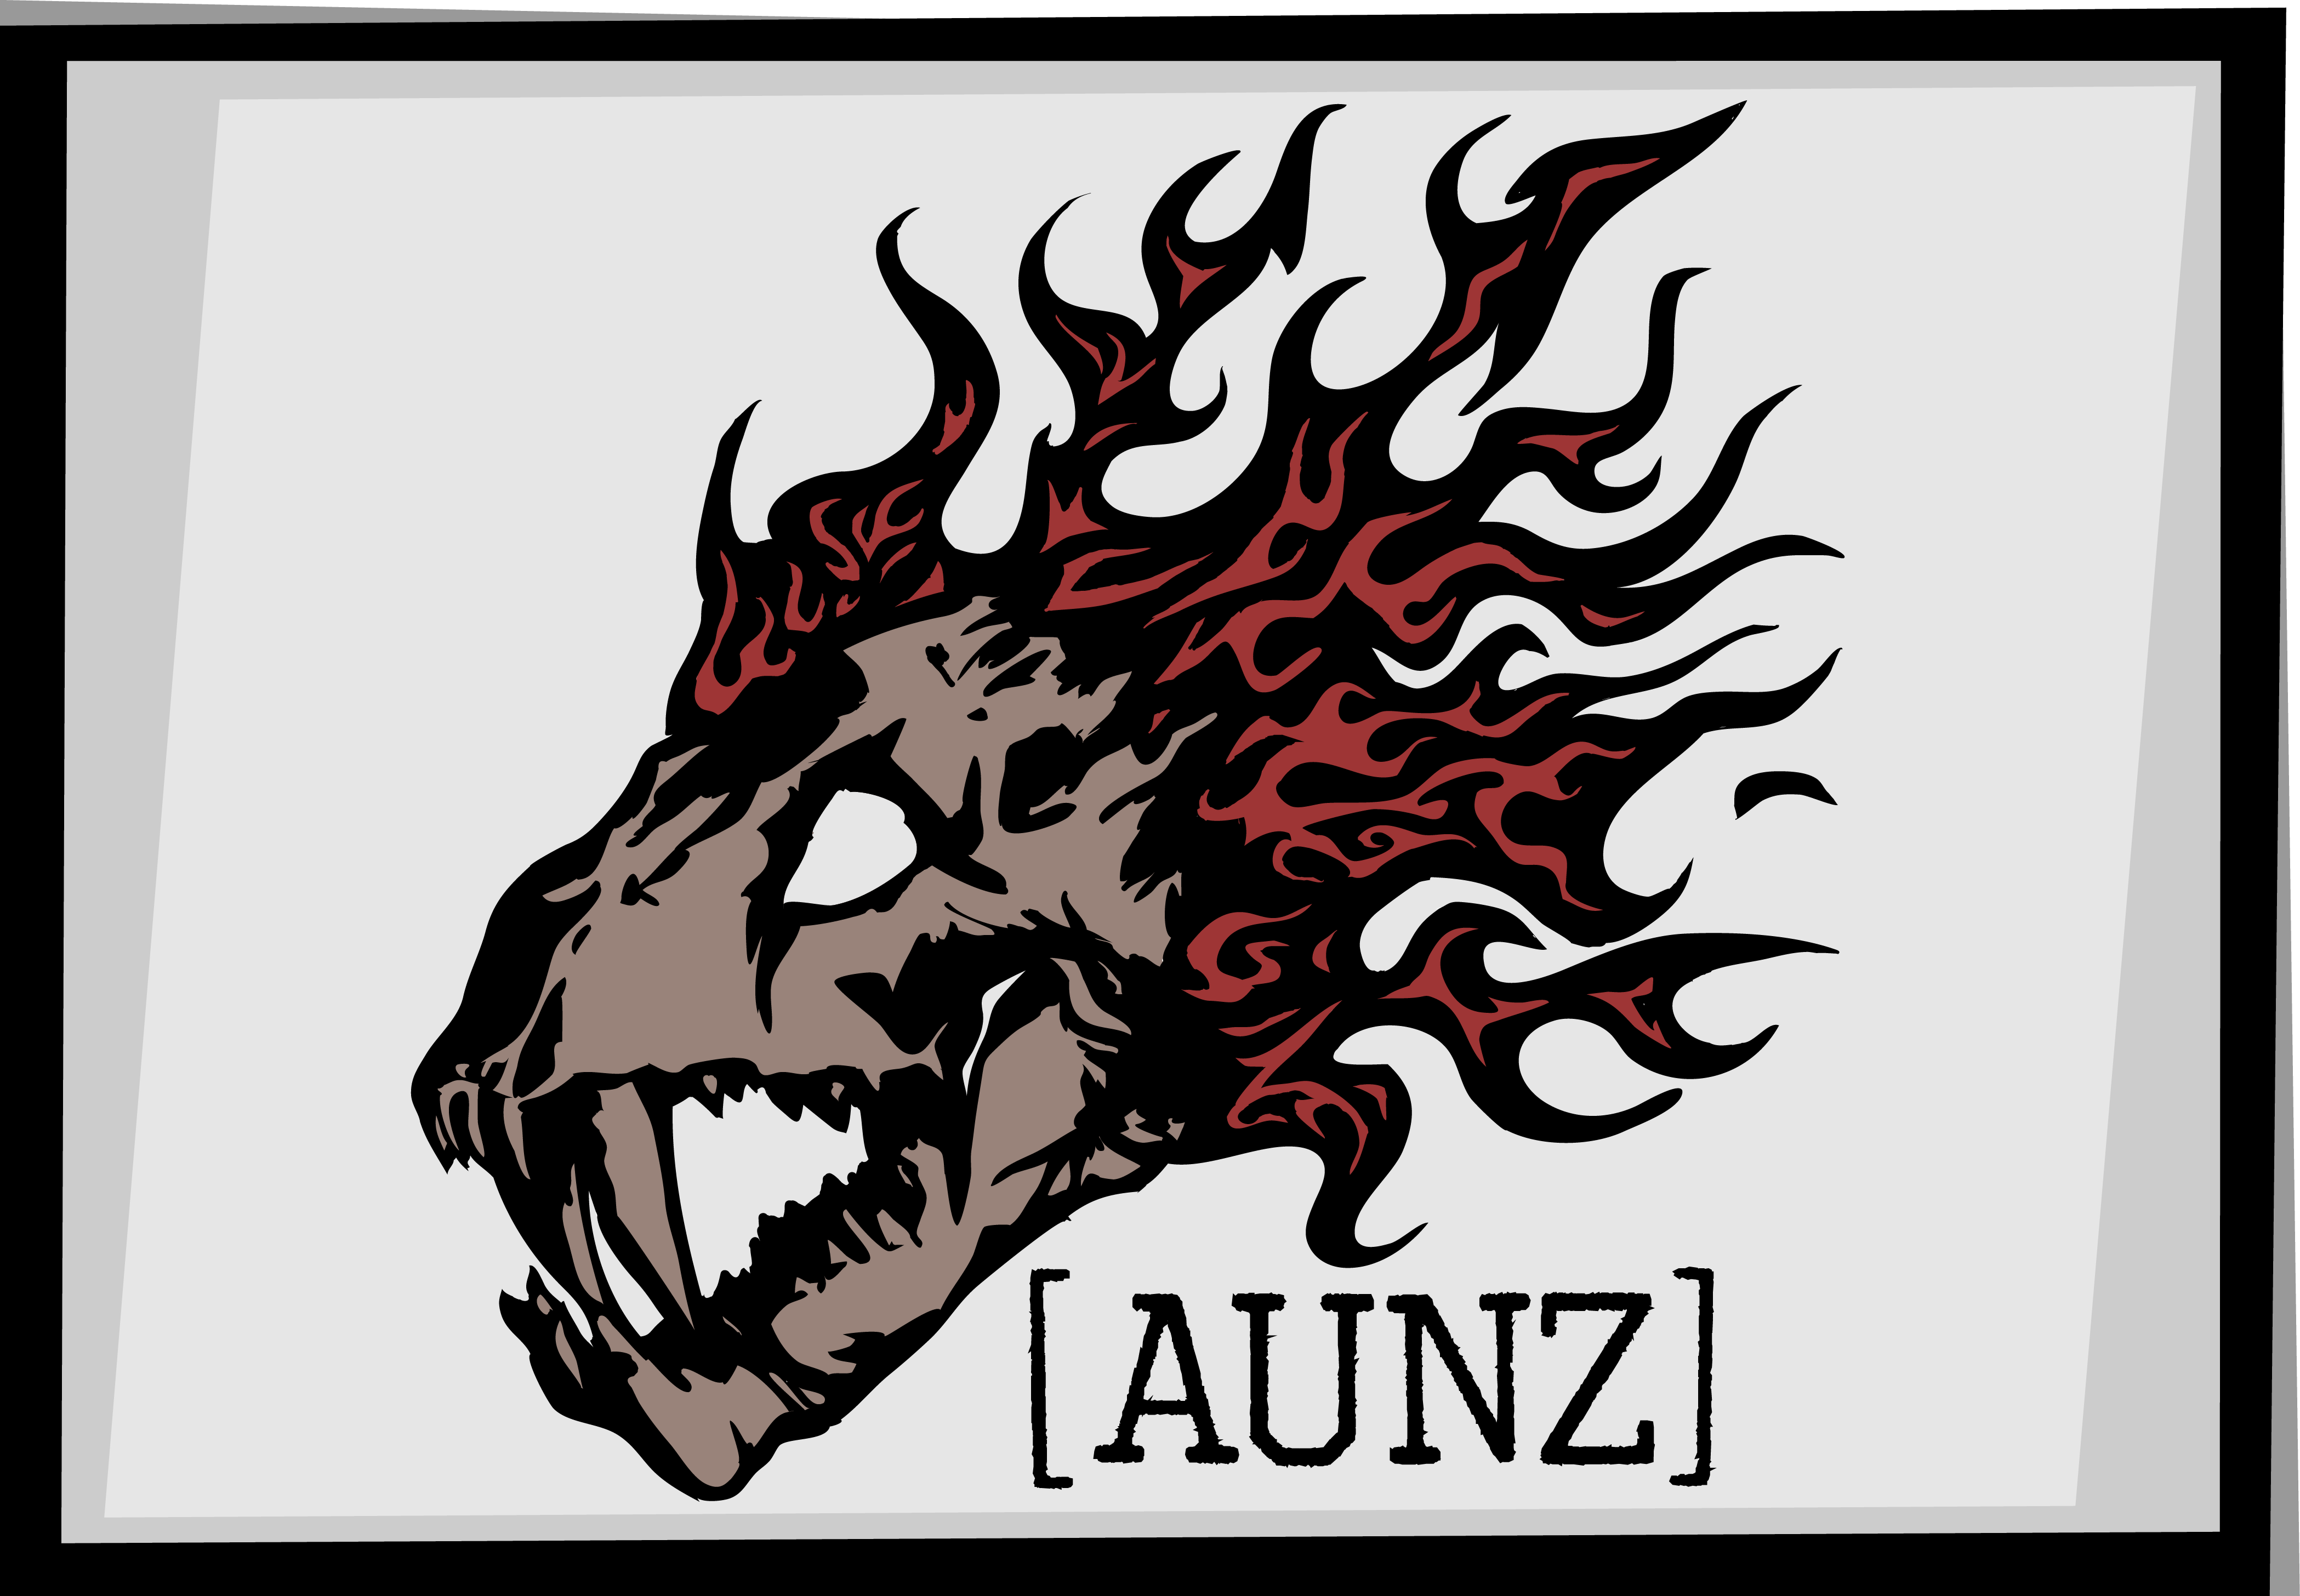 aunz_chatcover